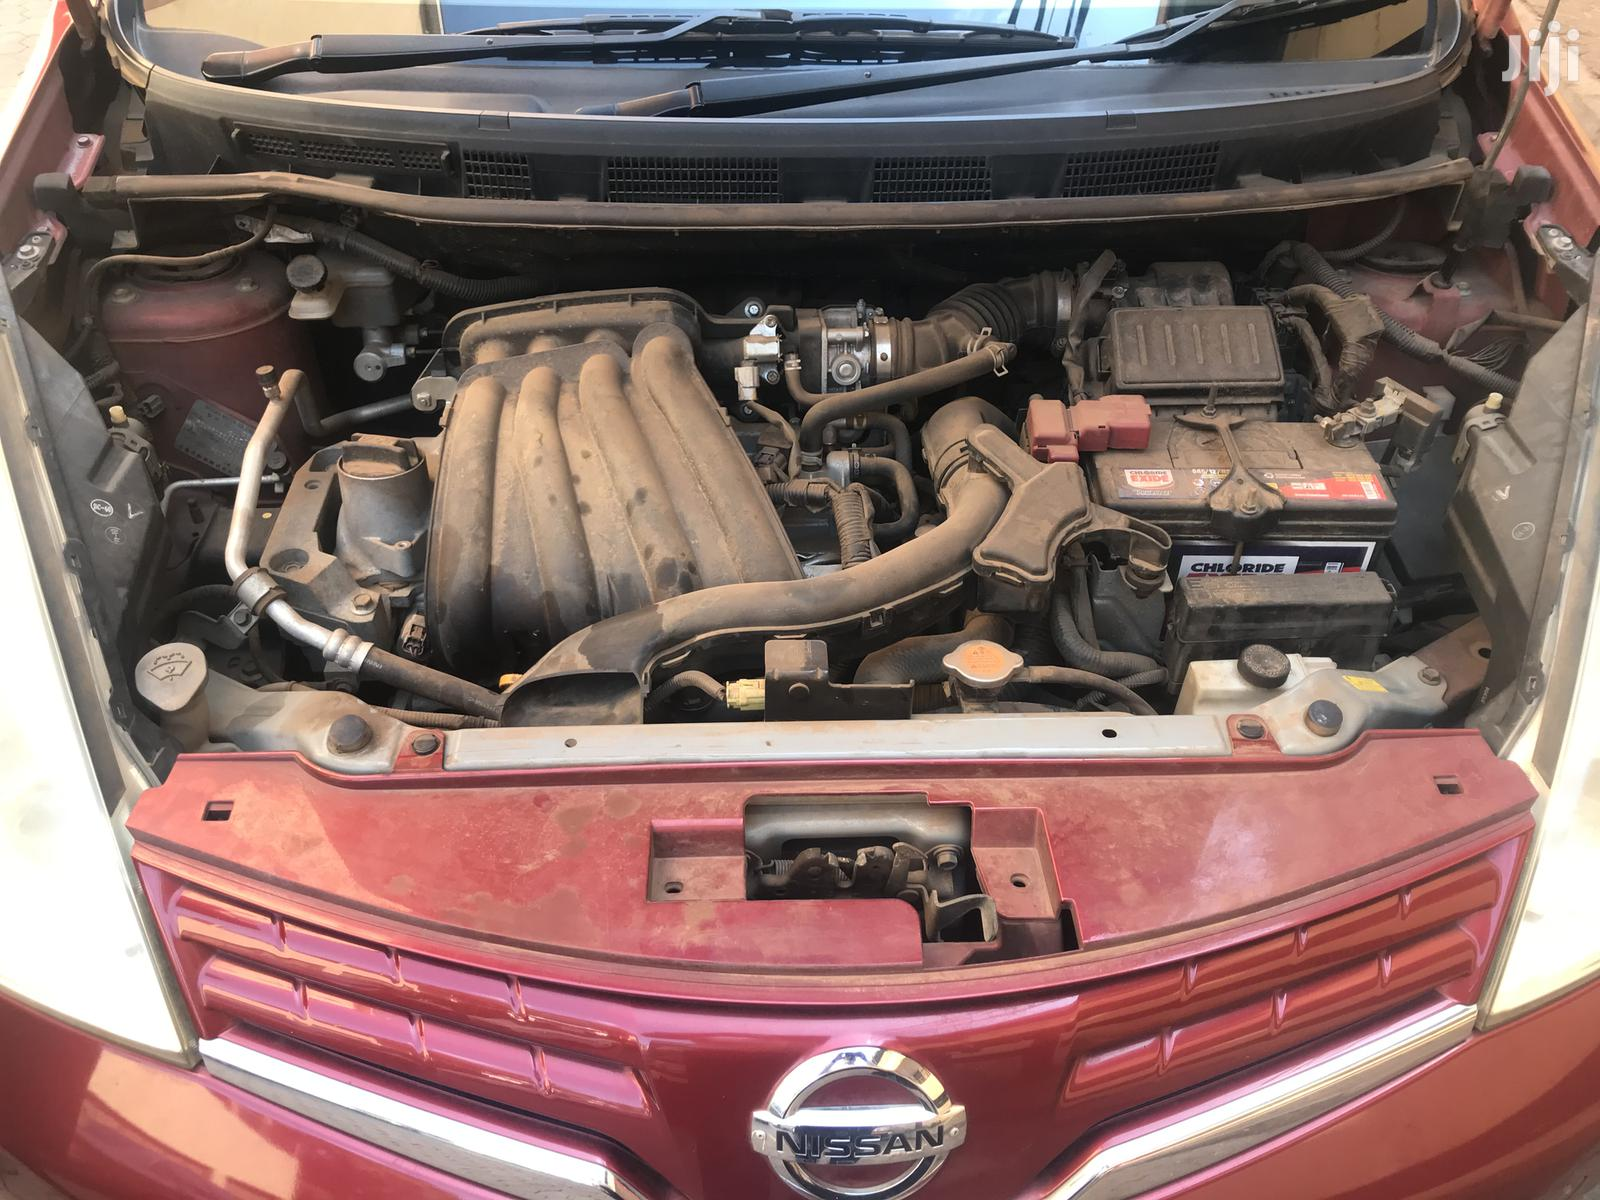 Nissan Note 2011 1.4 Red | Cars for sale in Nairobi Central, Nairobi, Kenya